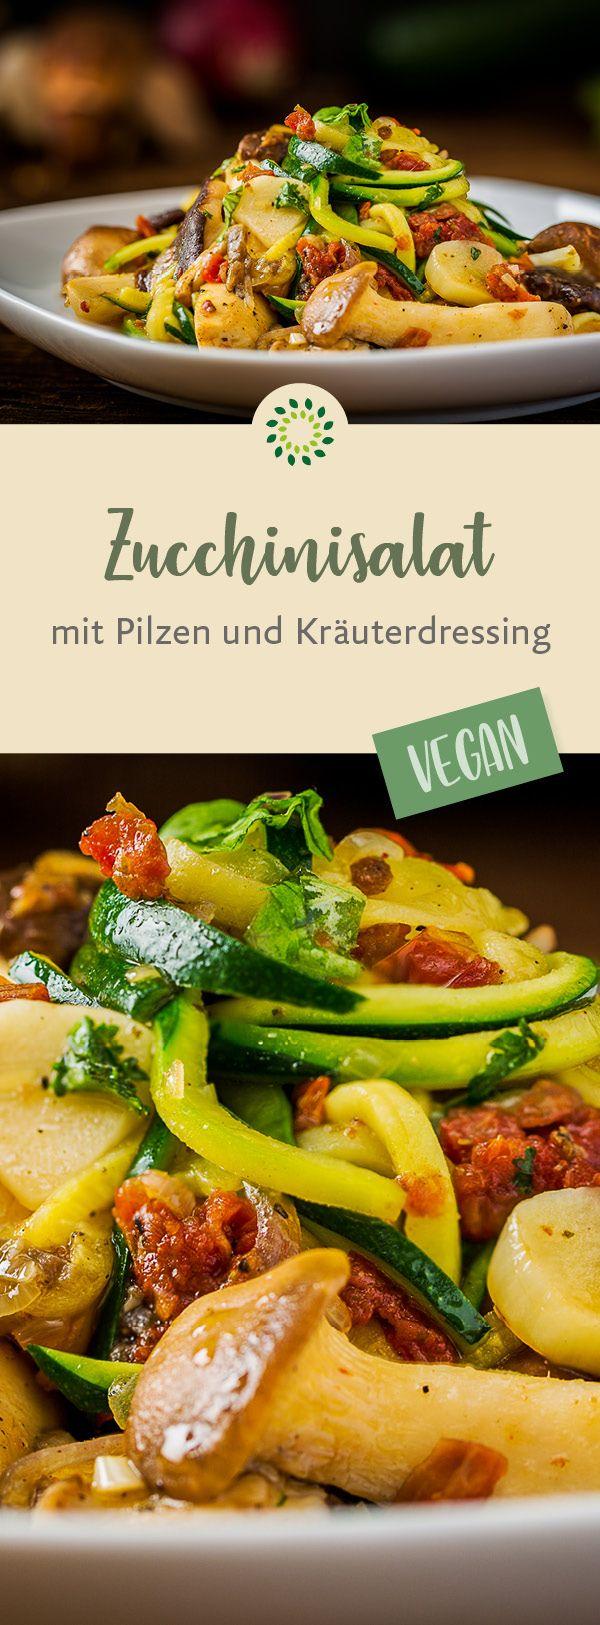 Zucchinisalat mit Pilzen und Kräuterdressing – Andrea Muhs